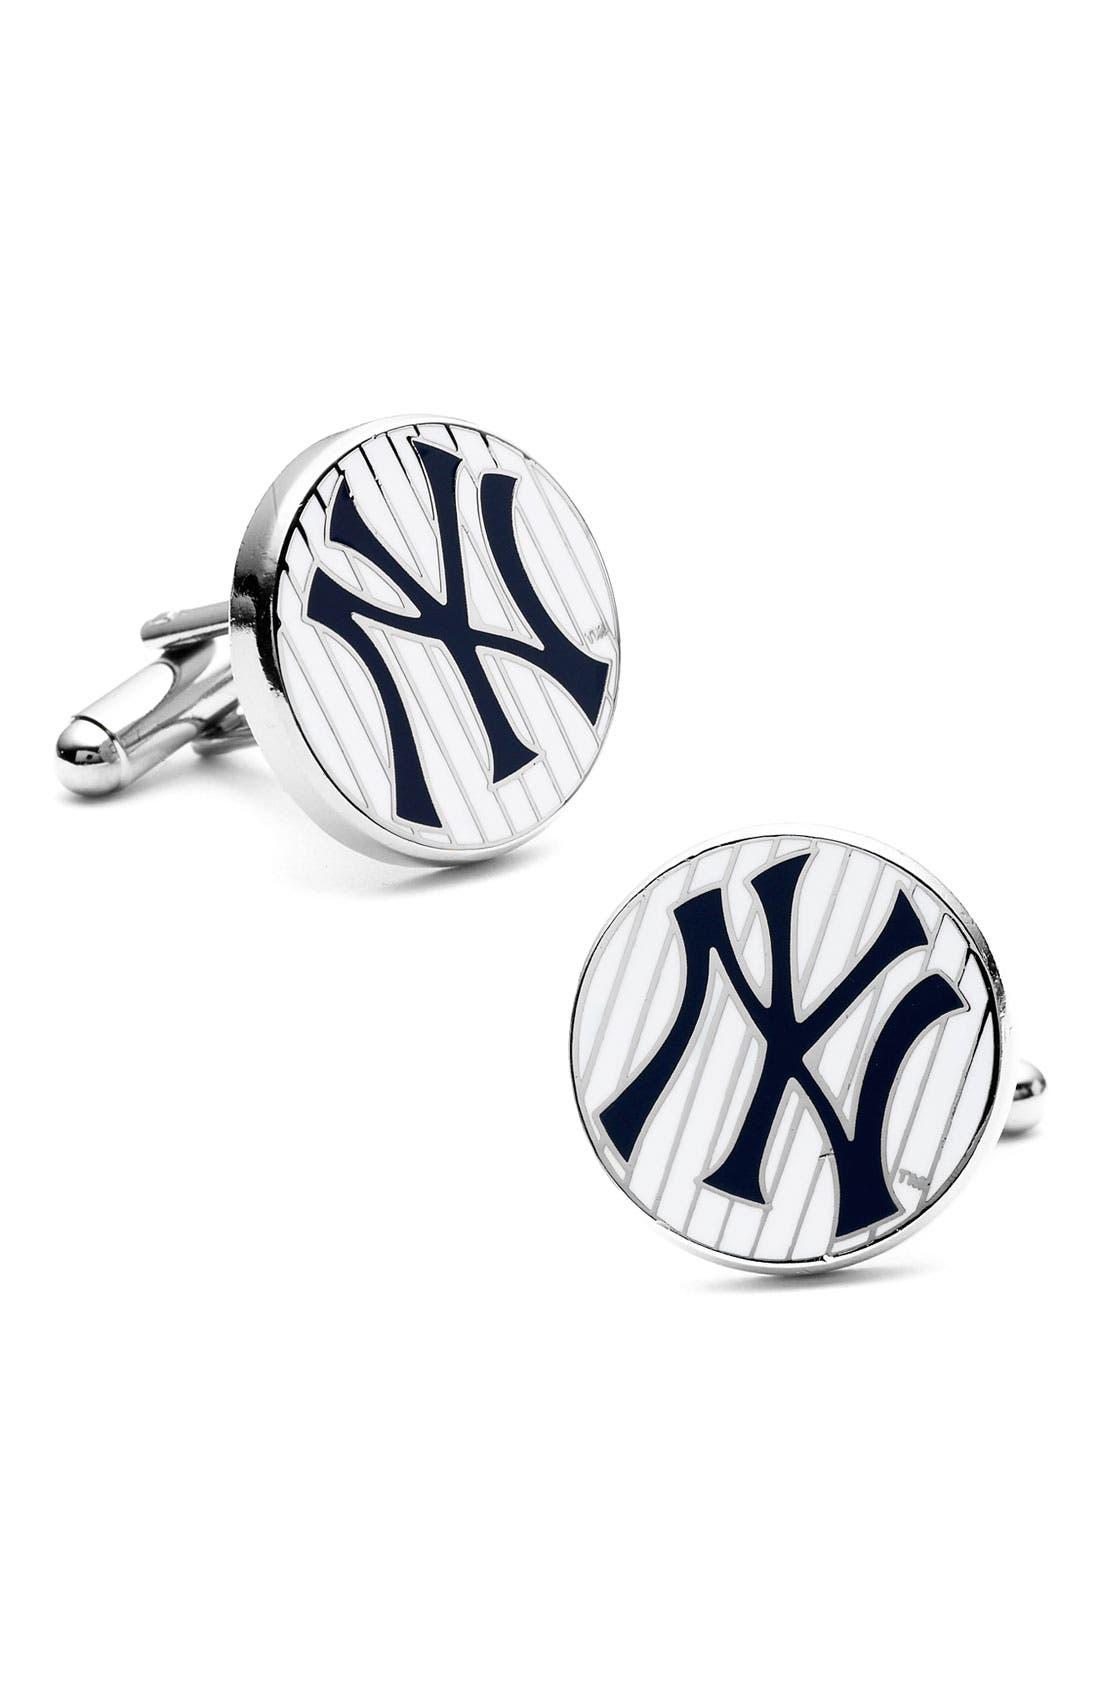 Cufflinks, Inc. 'New York Yankees' Cuff Links